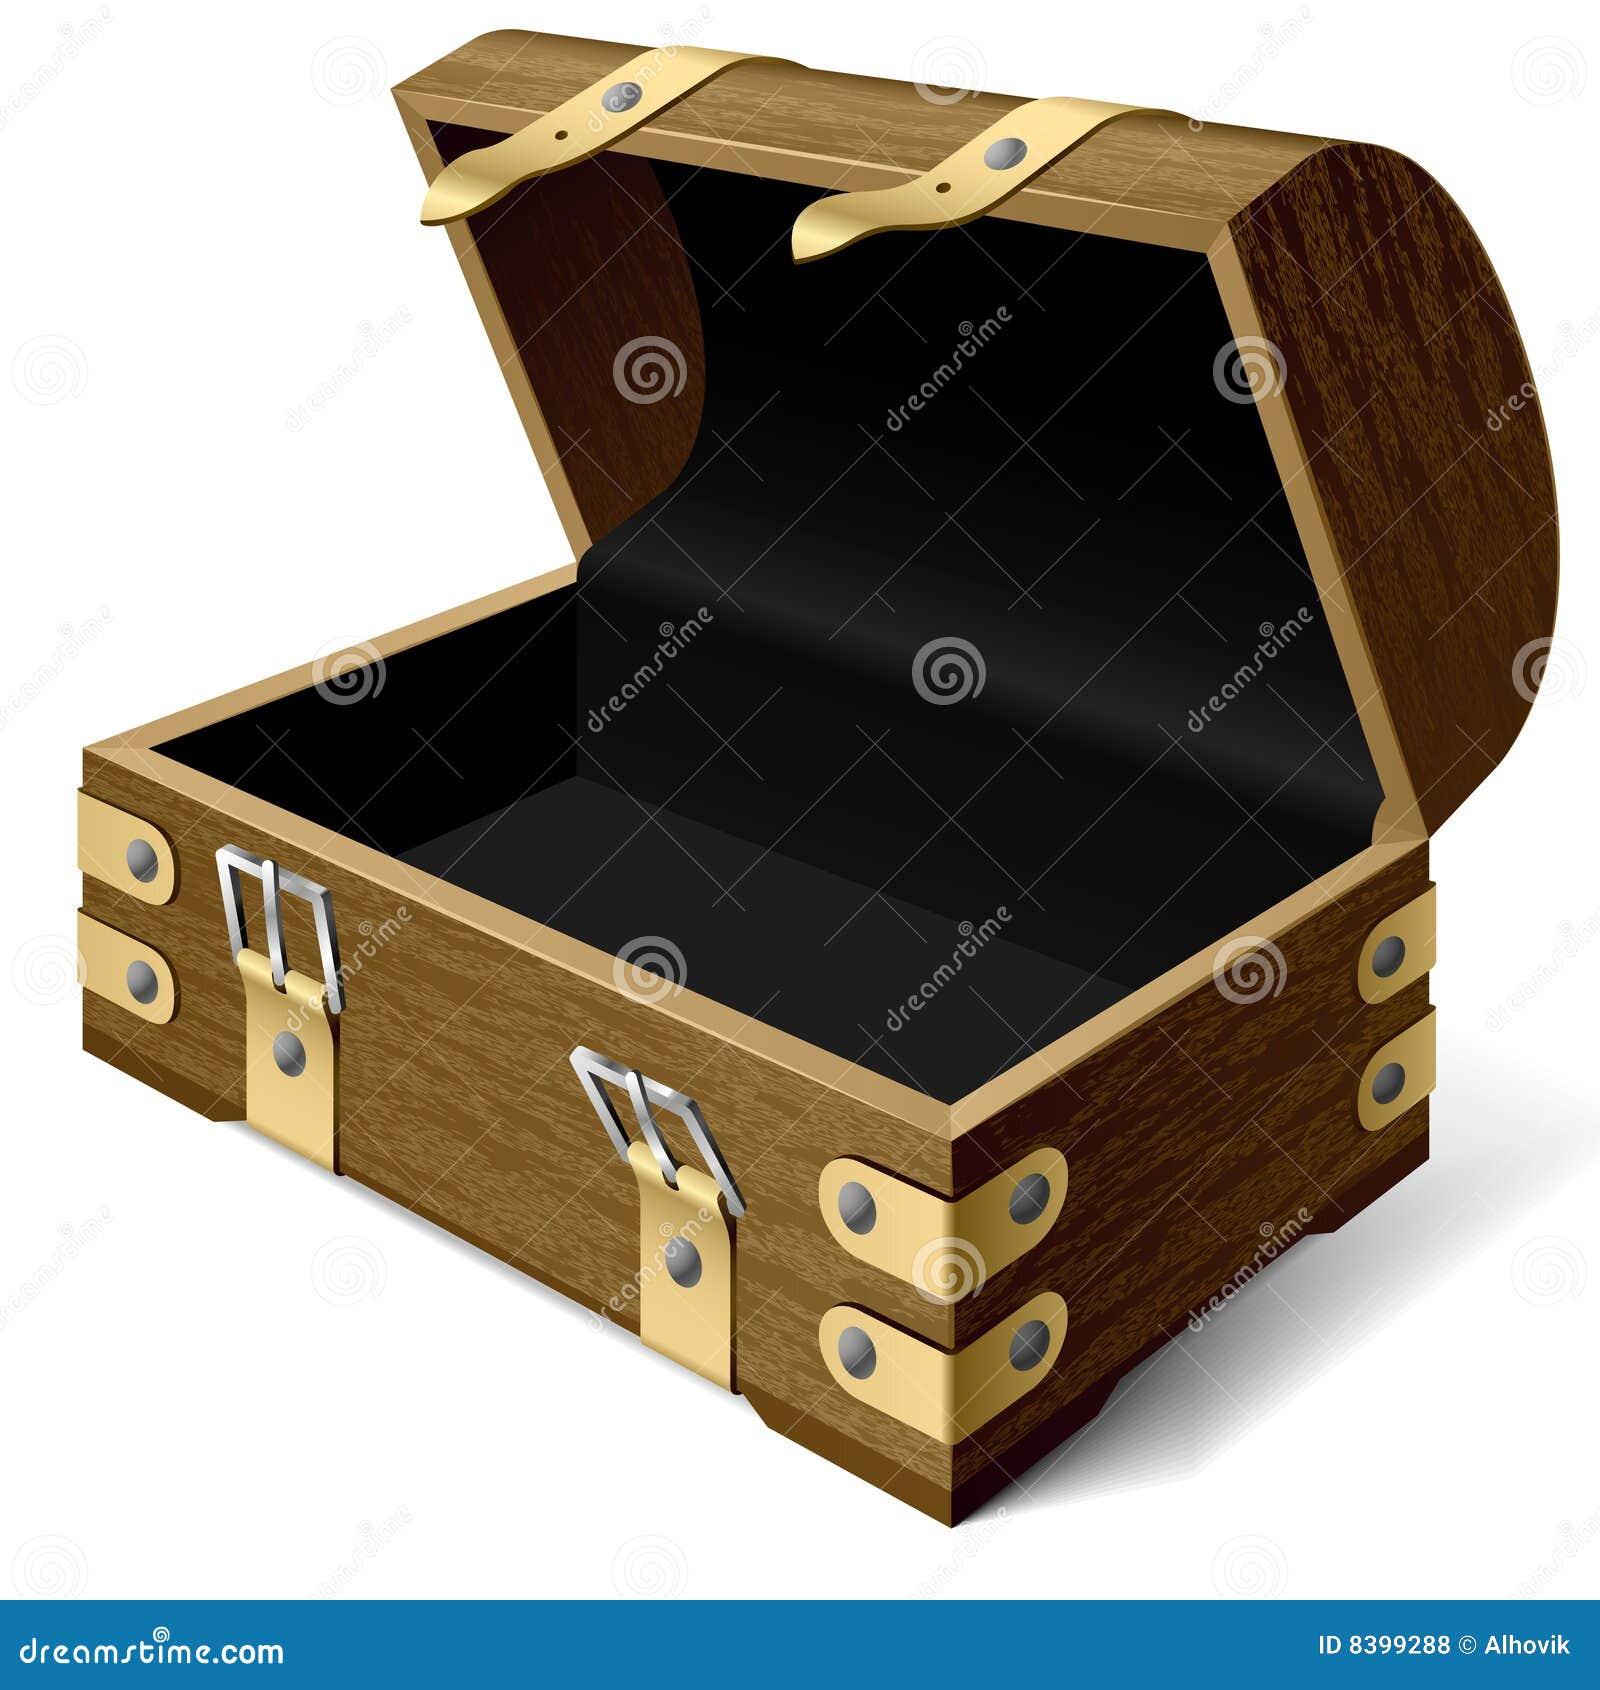 Caixa de tesouro vazia. Vetor.